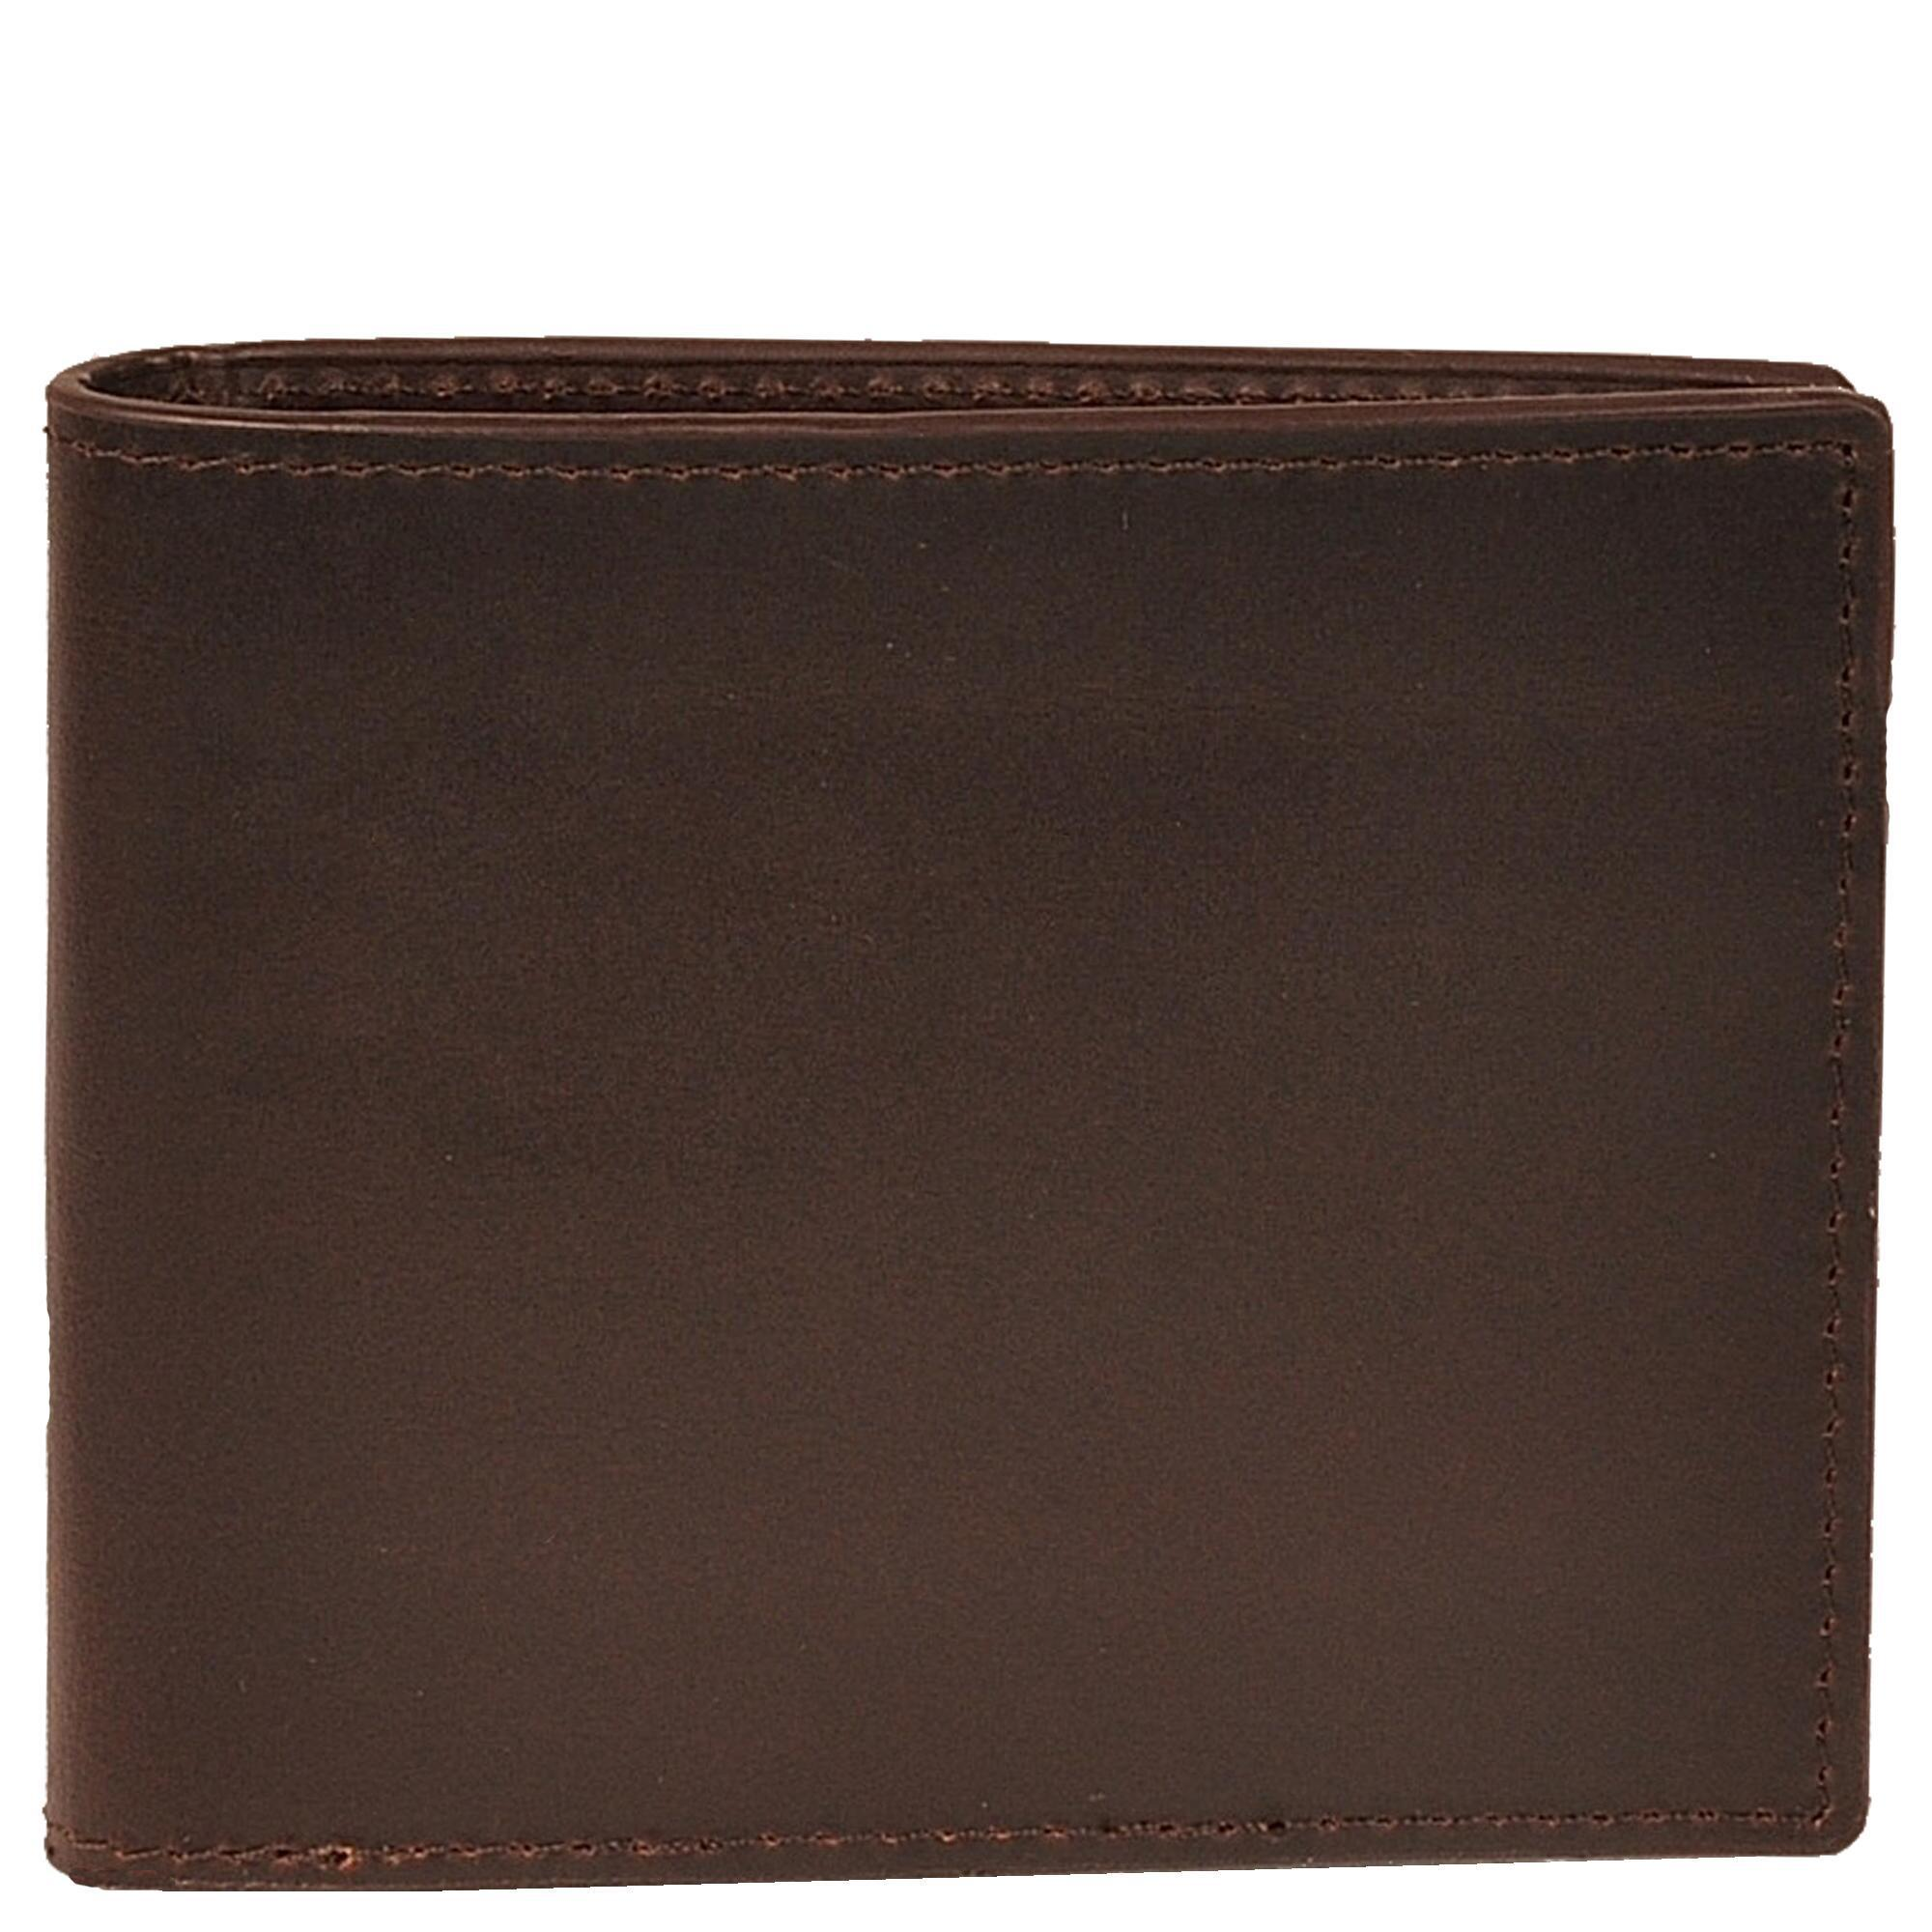 1623b27950e Lyst - Wilsons Leather Dakota Leather Bi-fold in Brown for Men